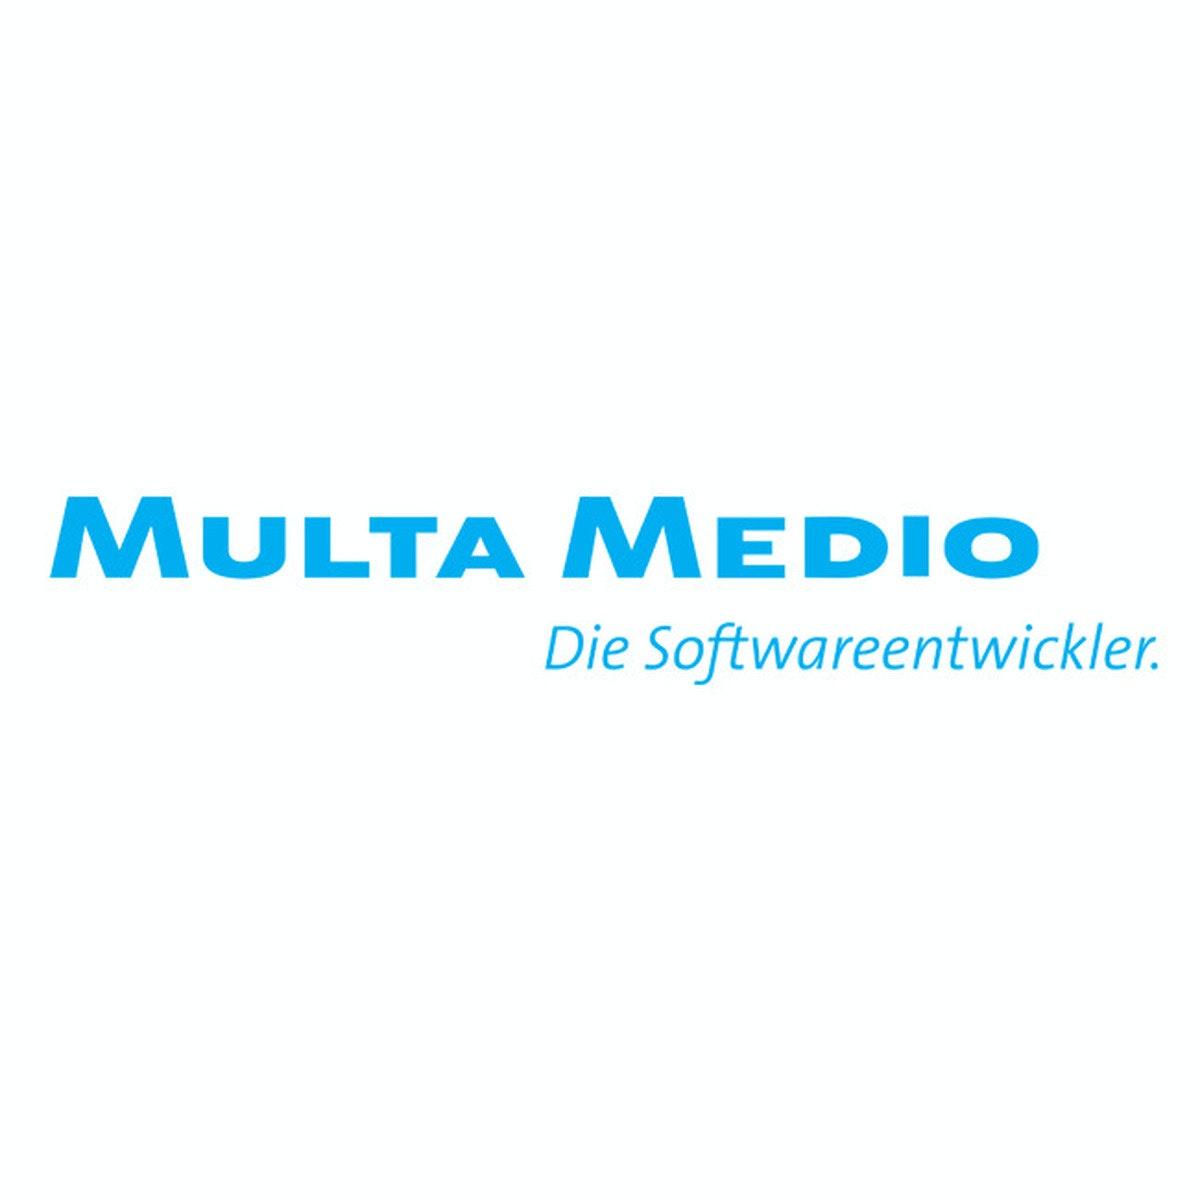 Softwaretester (m/w/d) in Würzburg